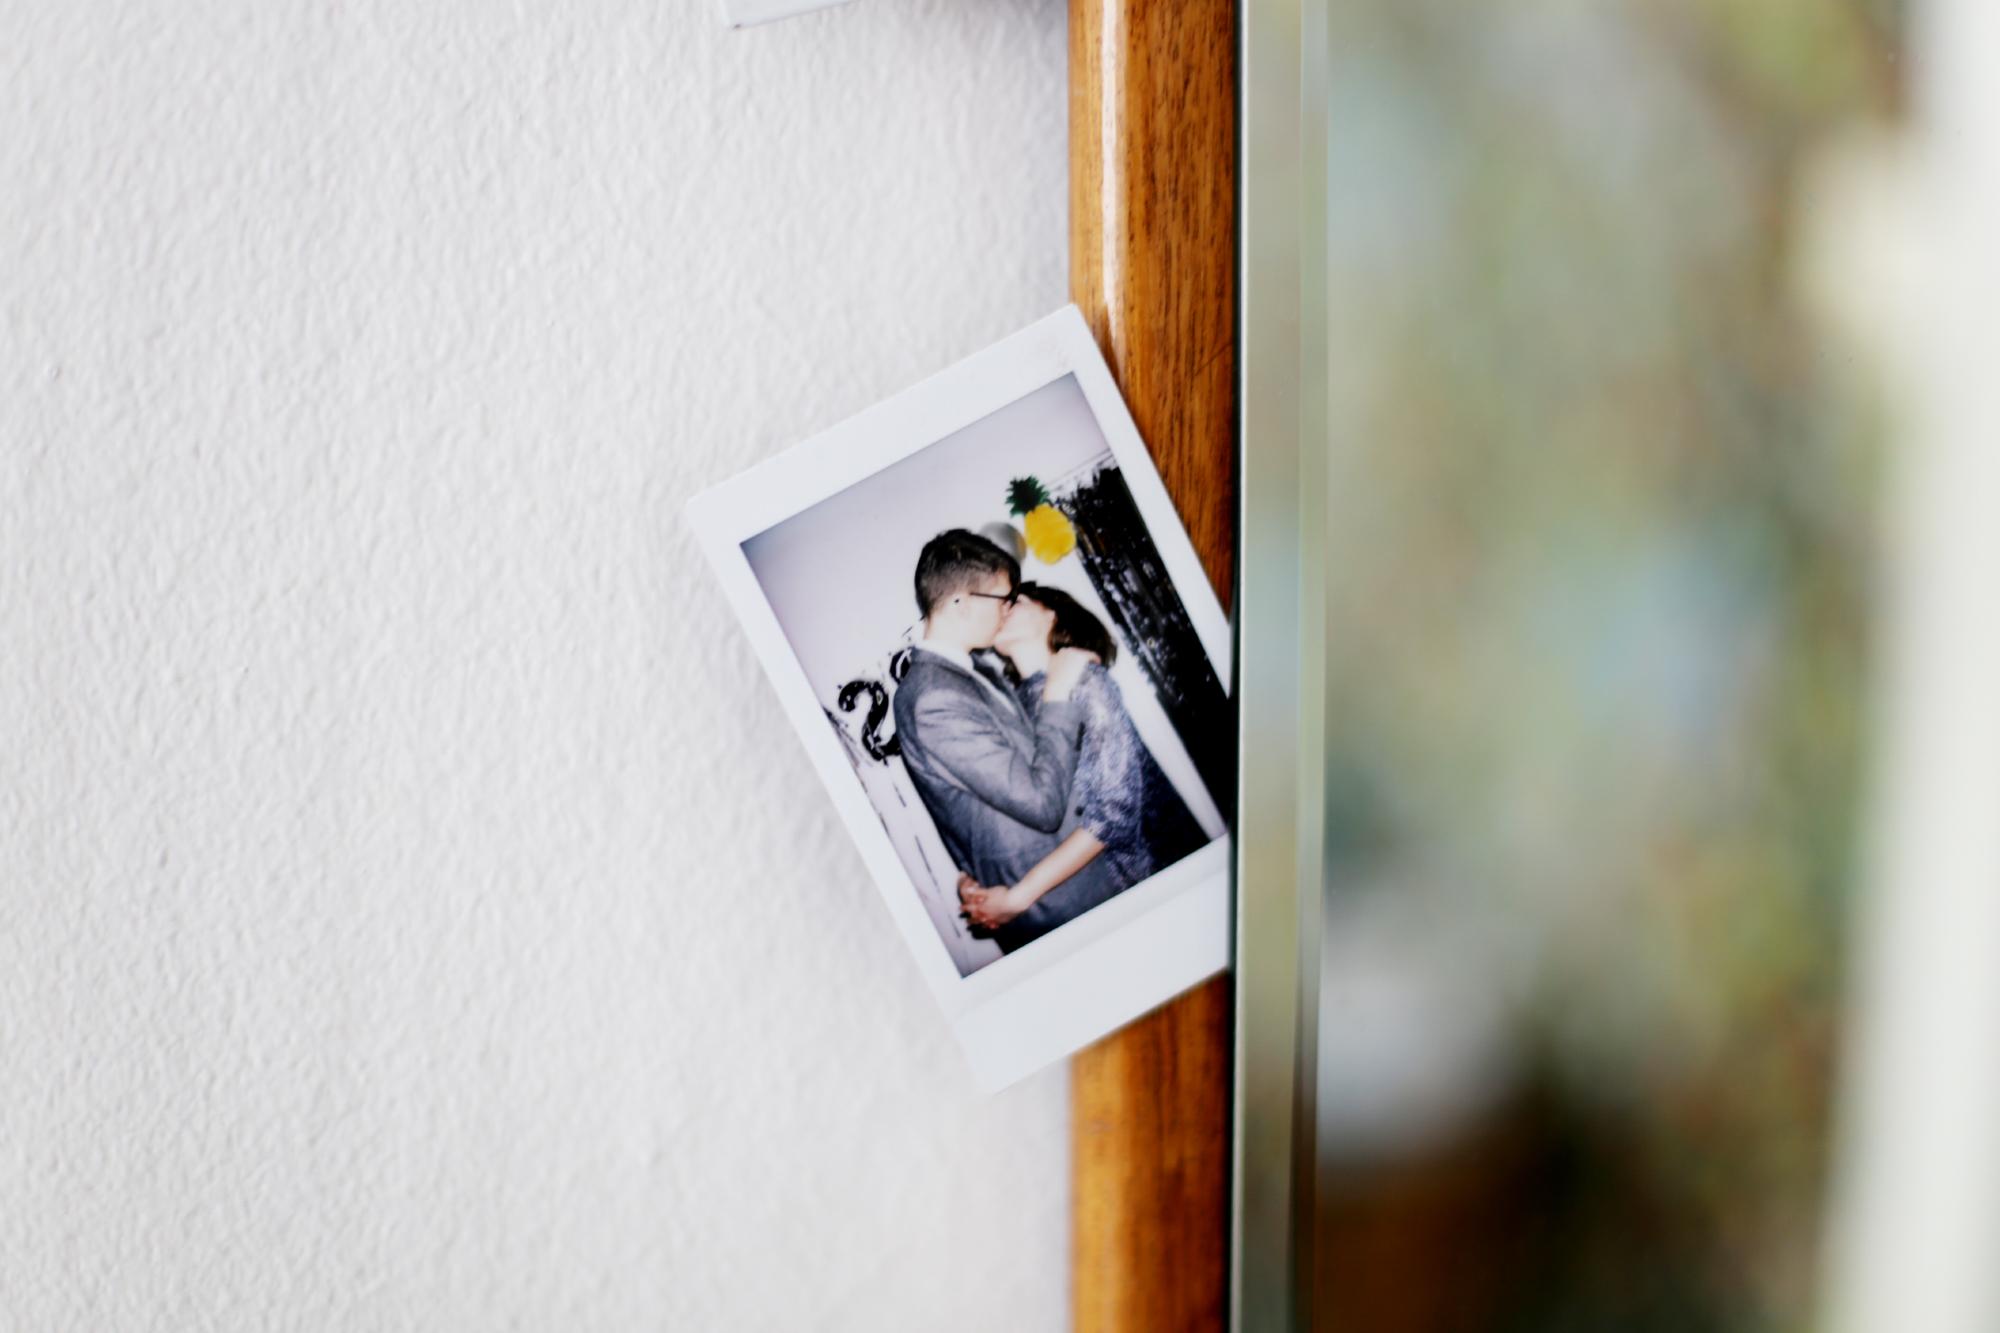 uppåt väggarna-sara edström12